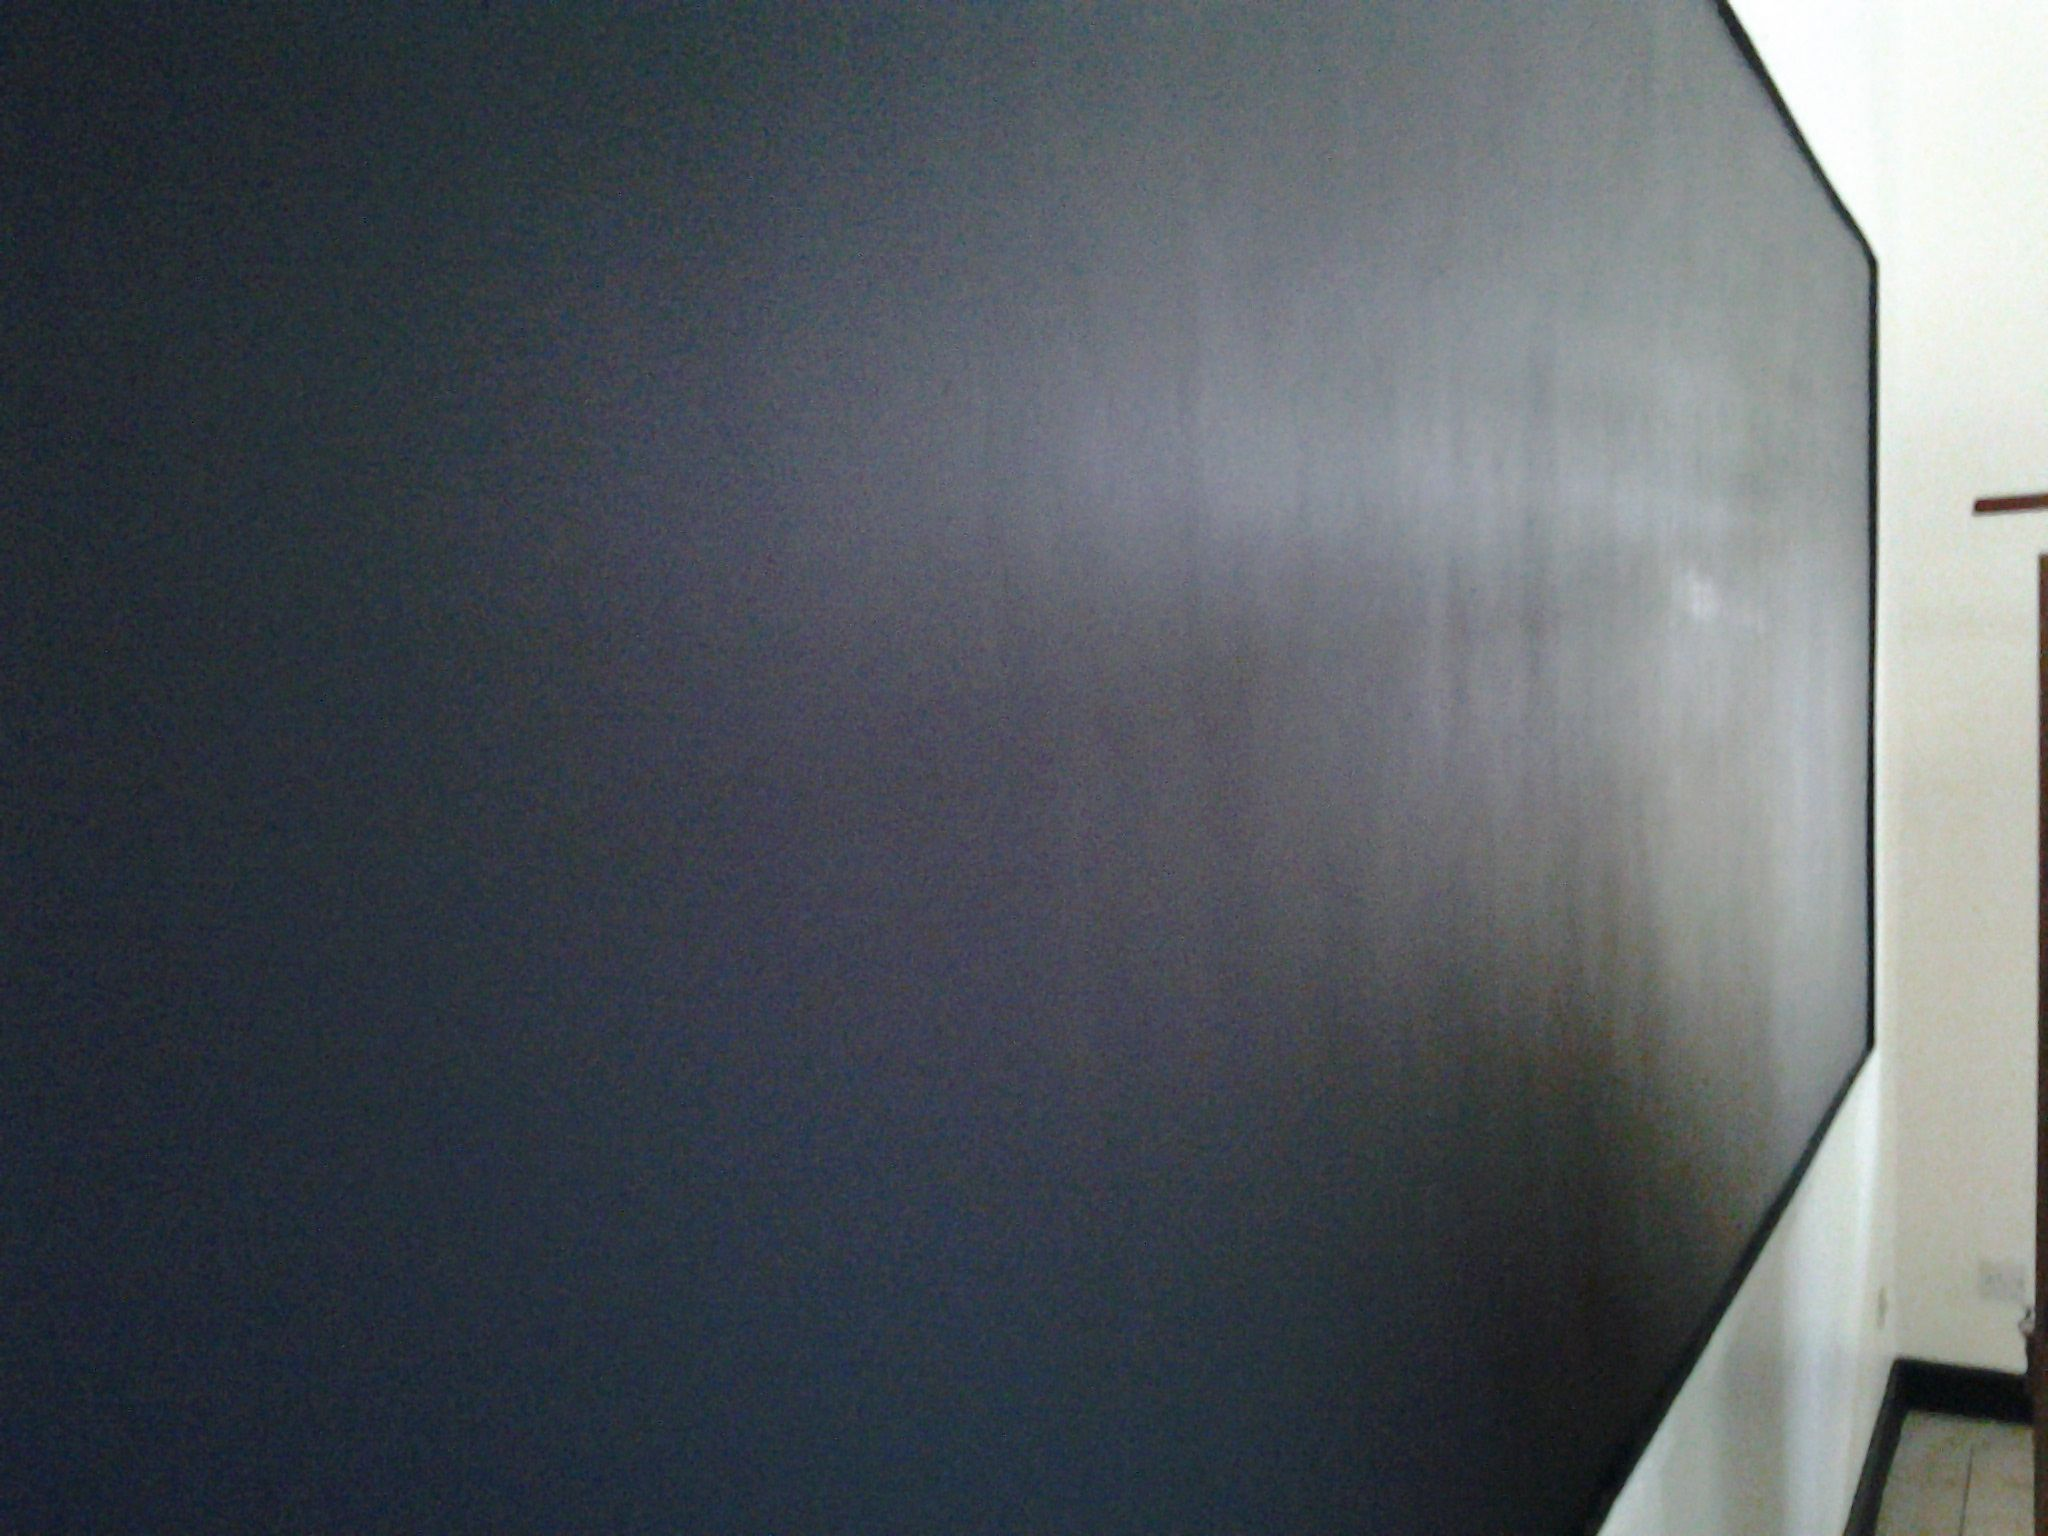 Buguruni classroom finished BLACKBOARD